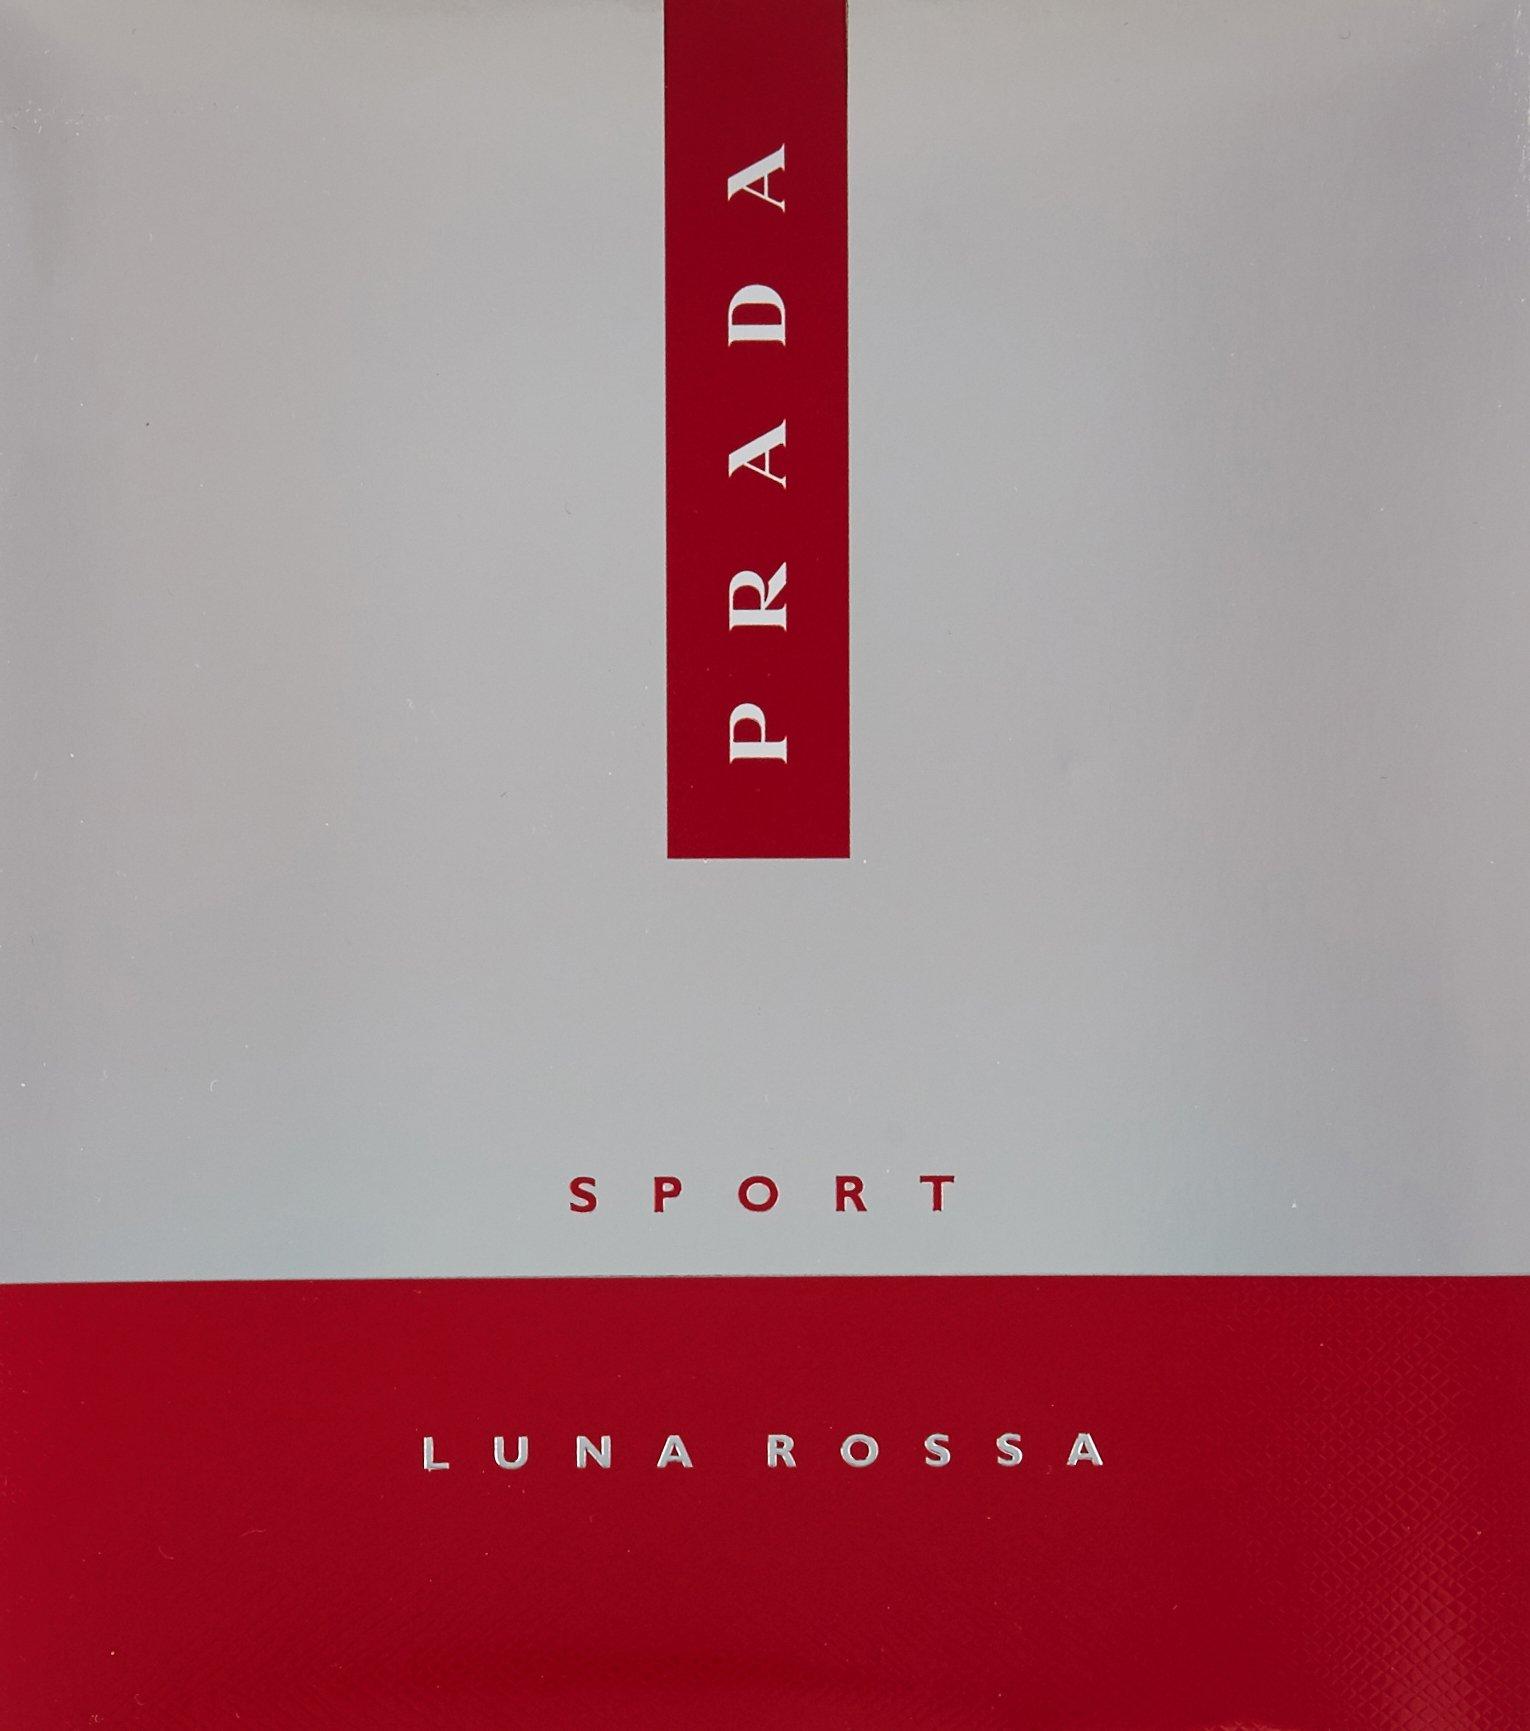 Prada Luna Rossa Sport for Men 3 PC (3.4 Eau De Toilette / 3.4 shower gel / 3.4 after shave balm) by Prada (Image #2)